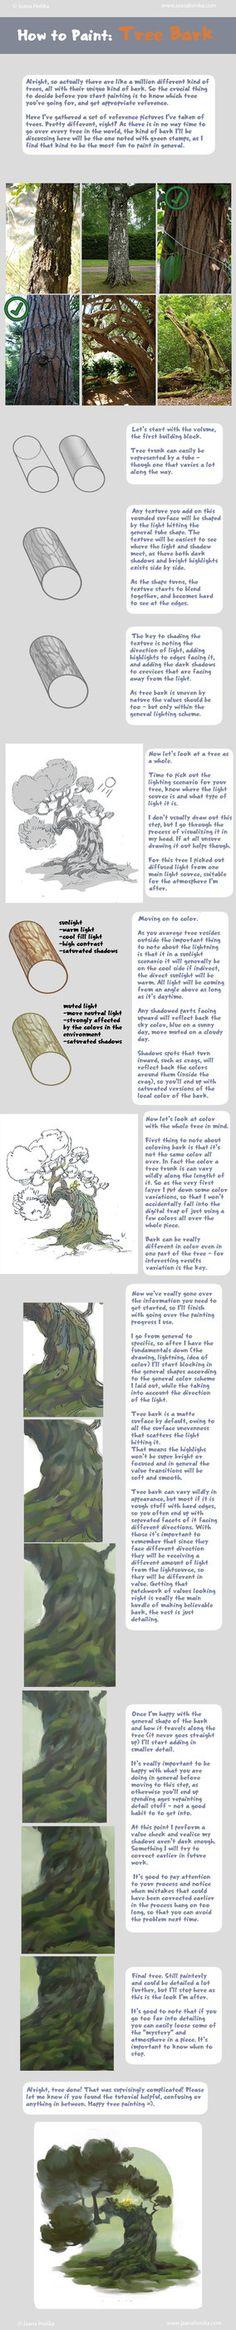 How to Paint Tree Ba